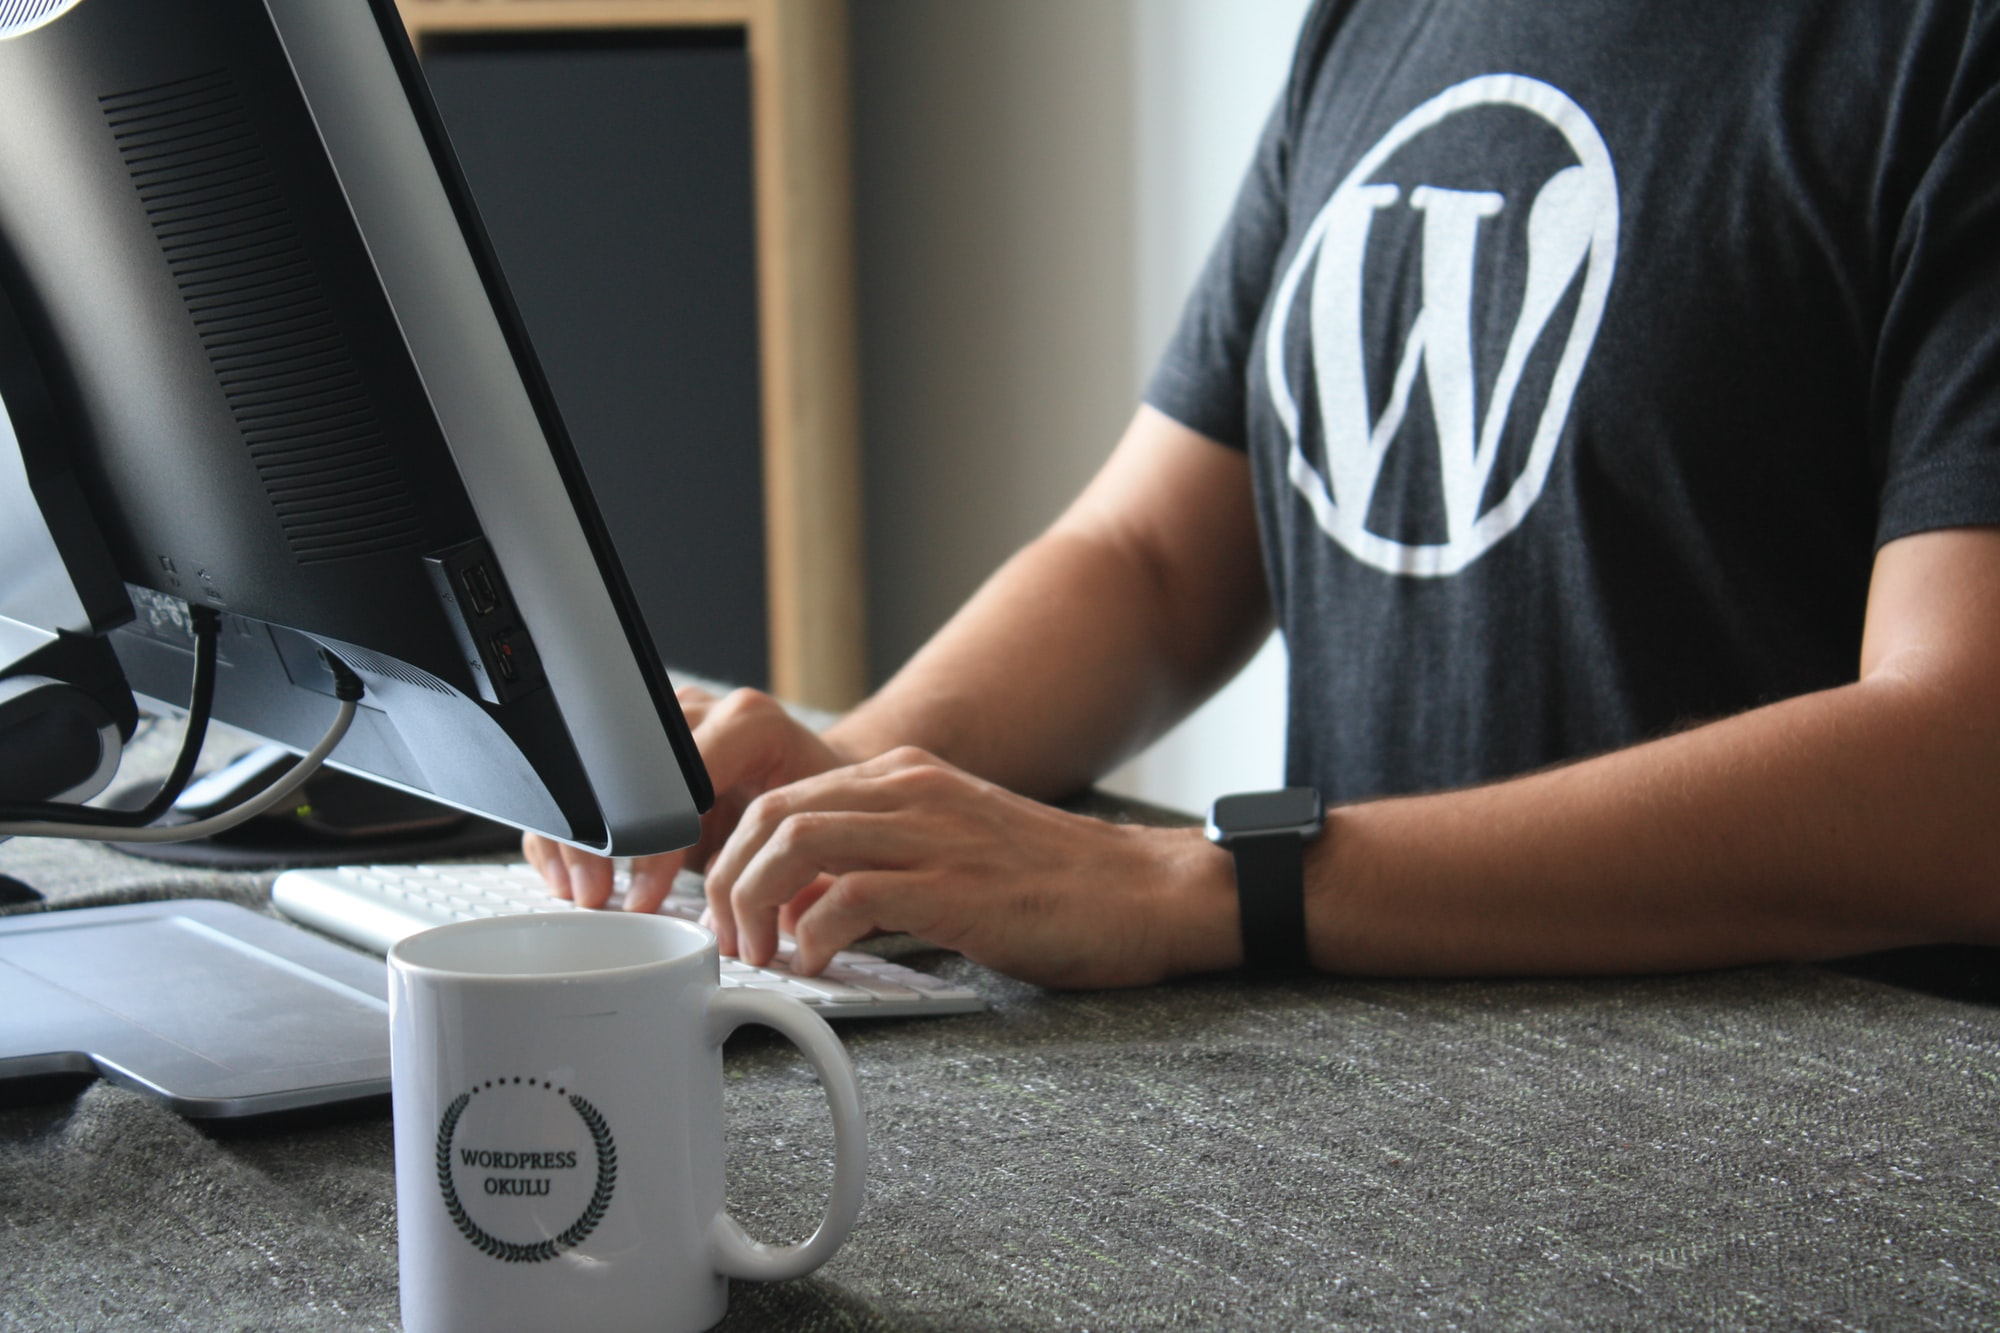 Write a post on WordPress